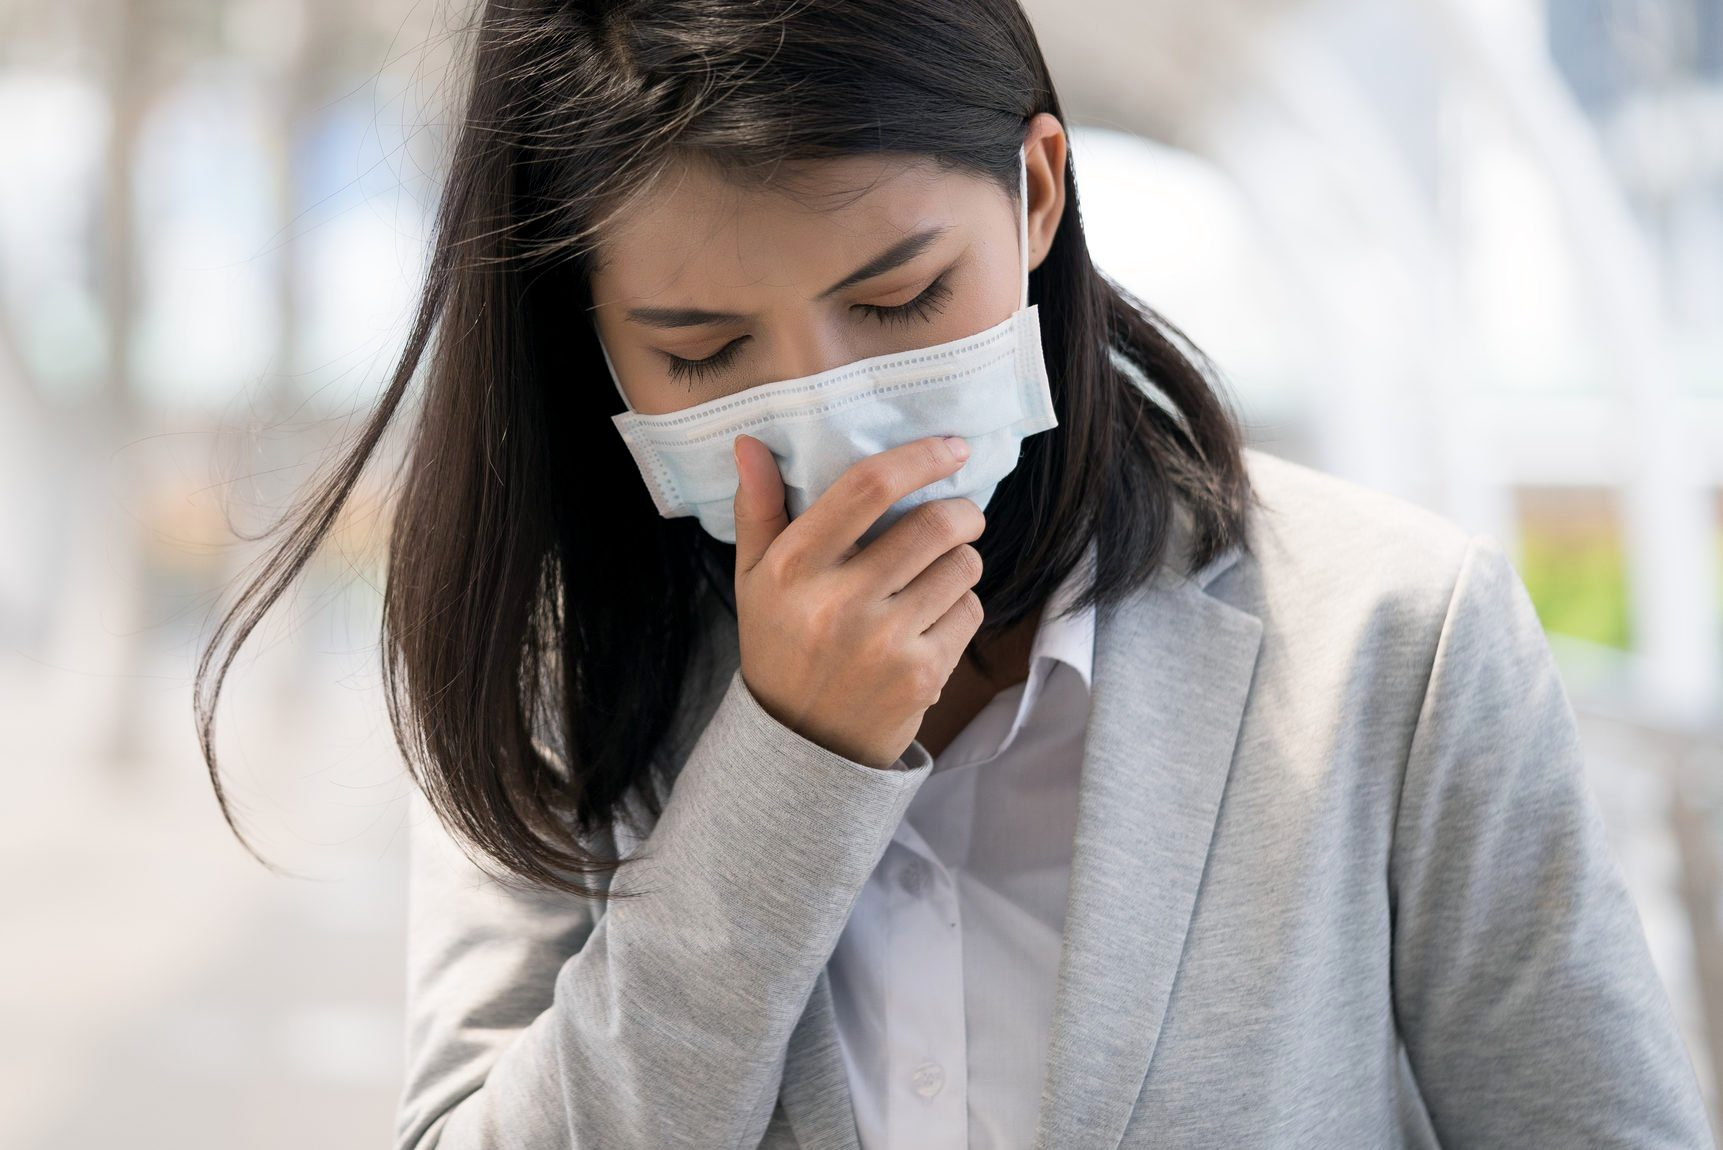 having a cough